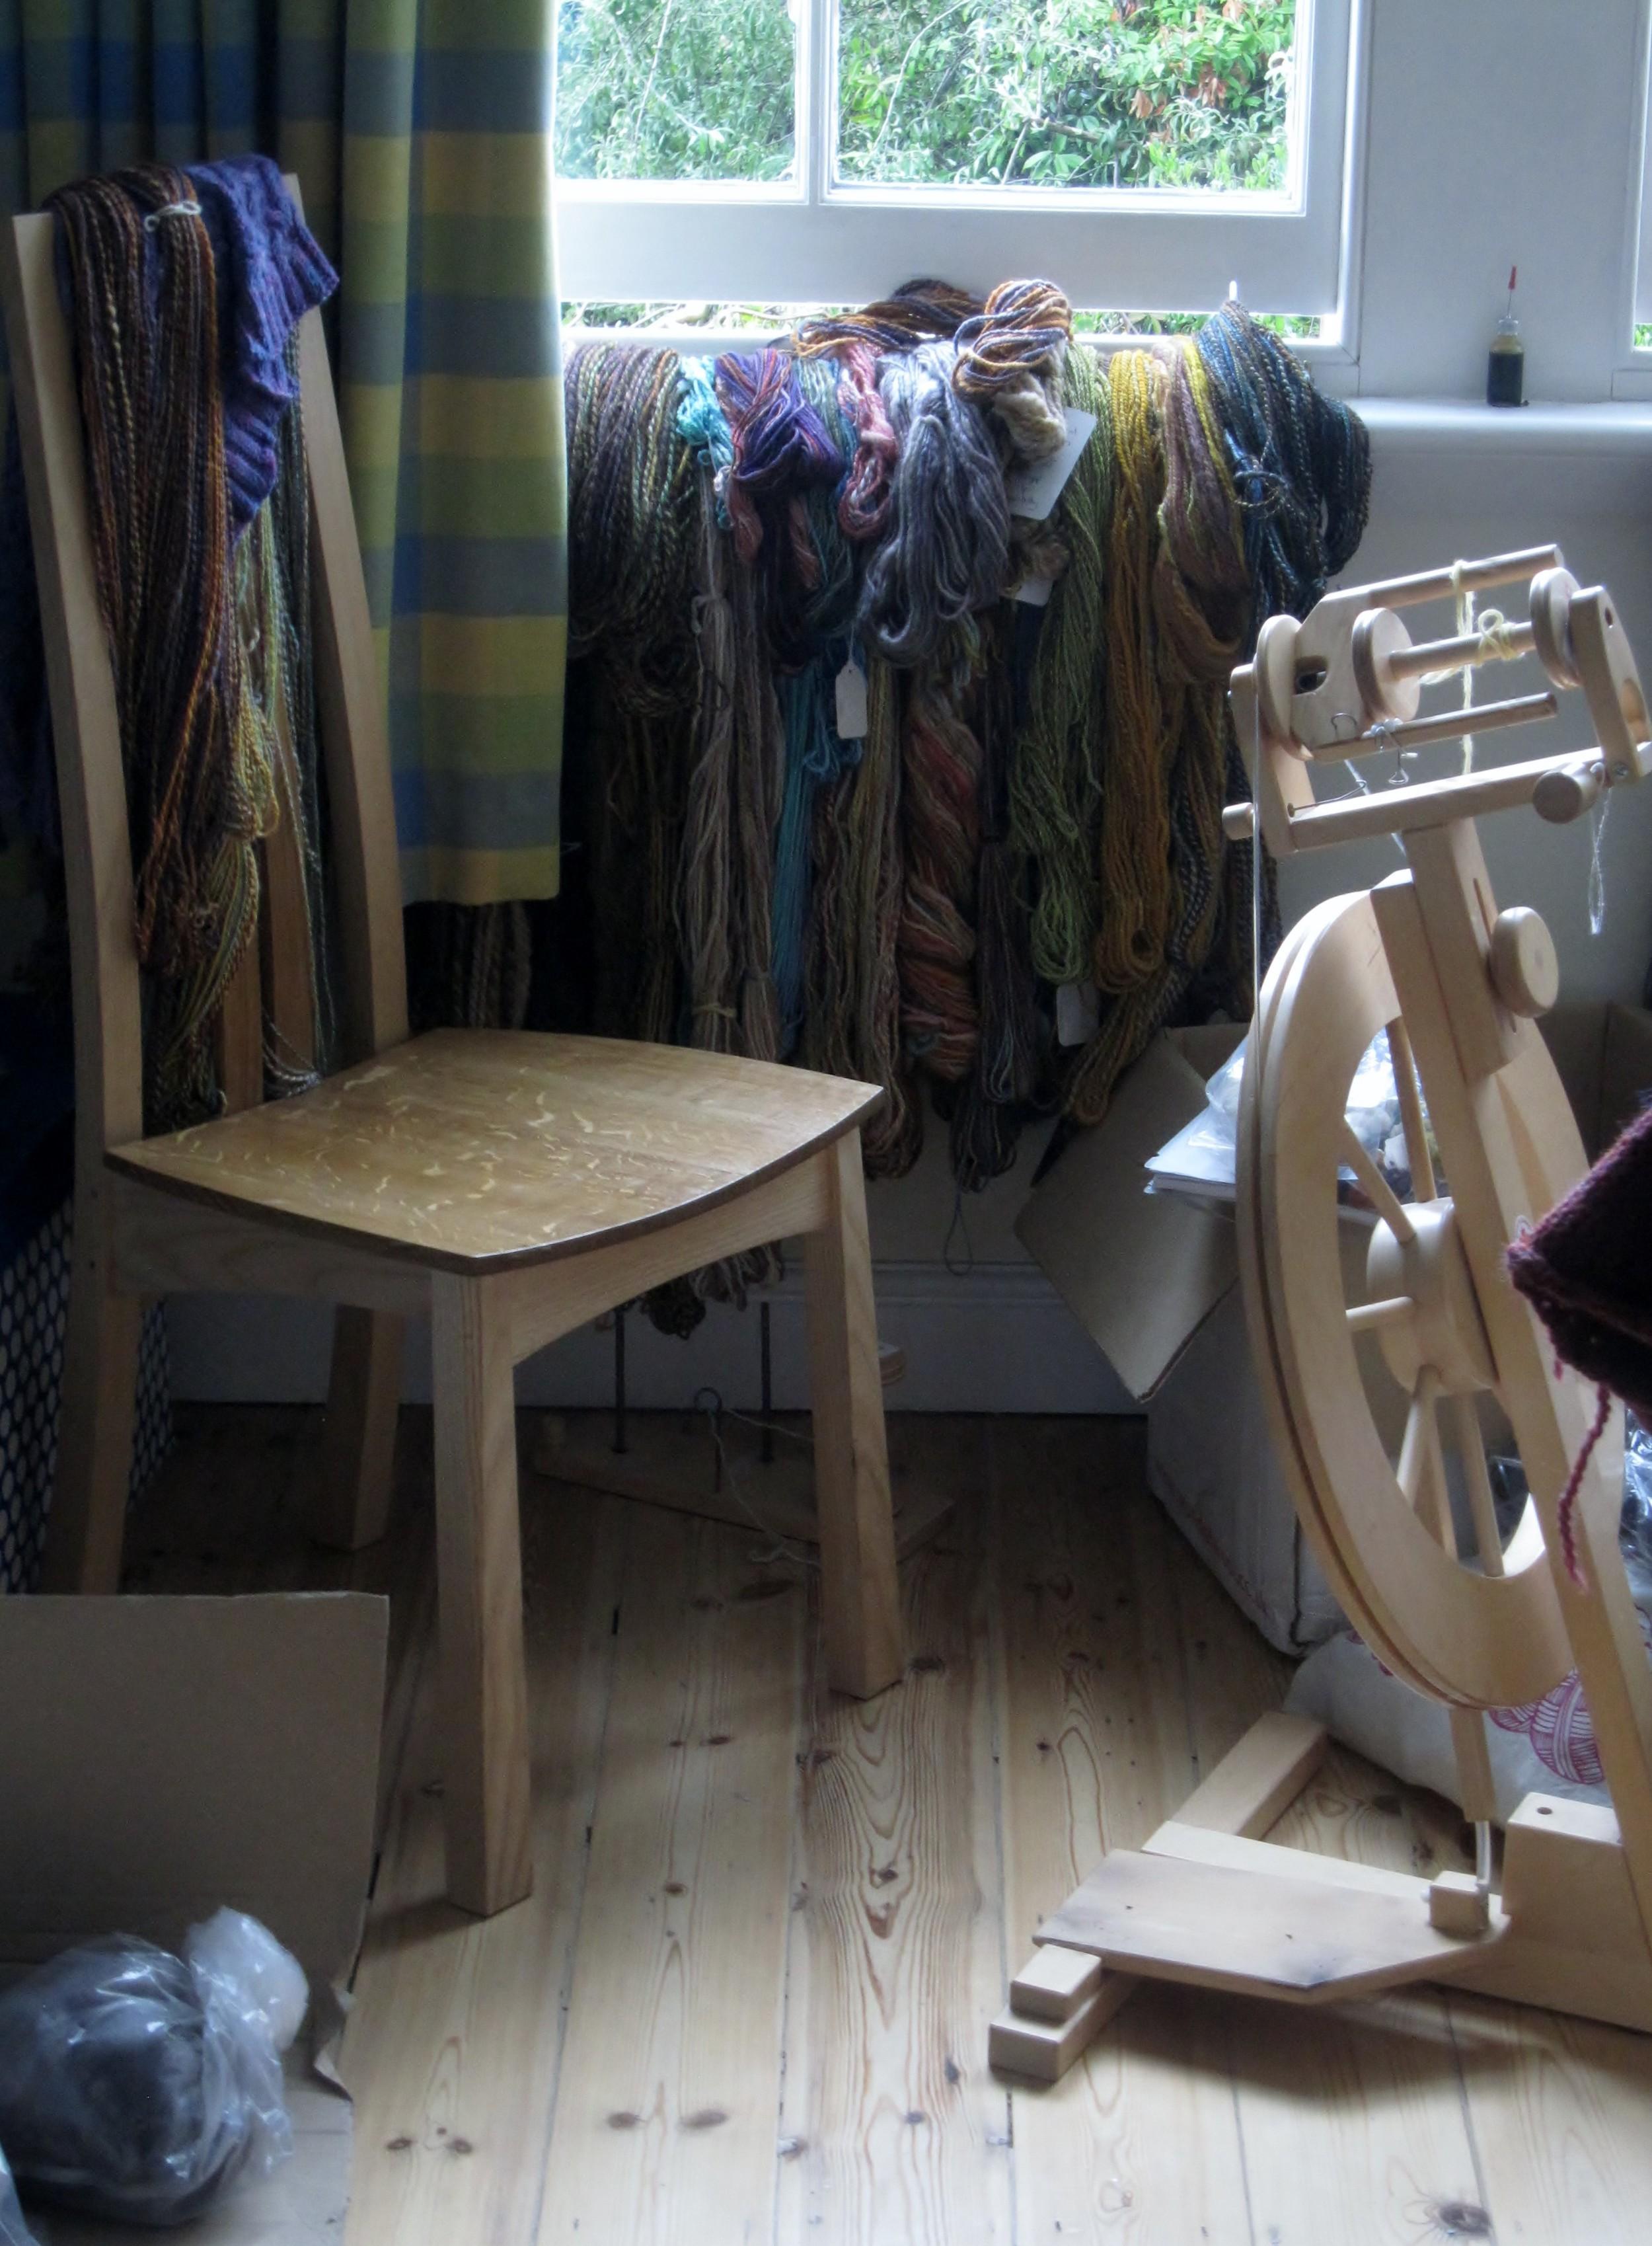 Spinning nook